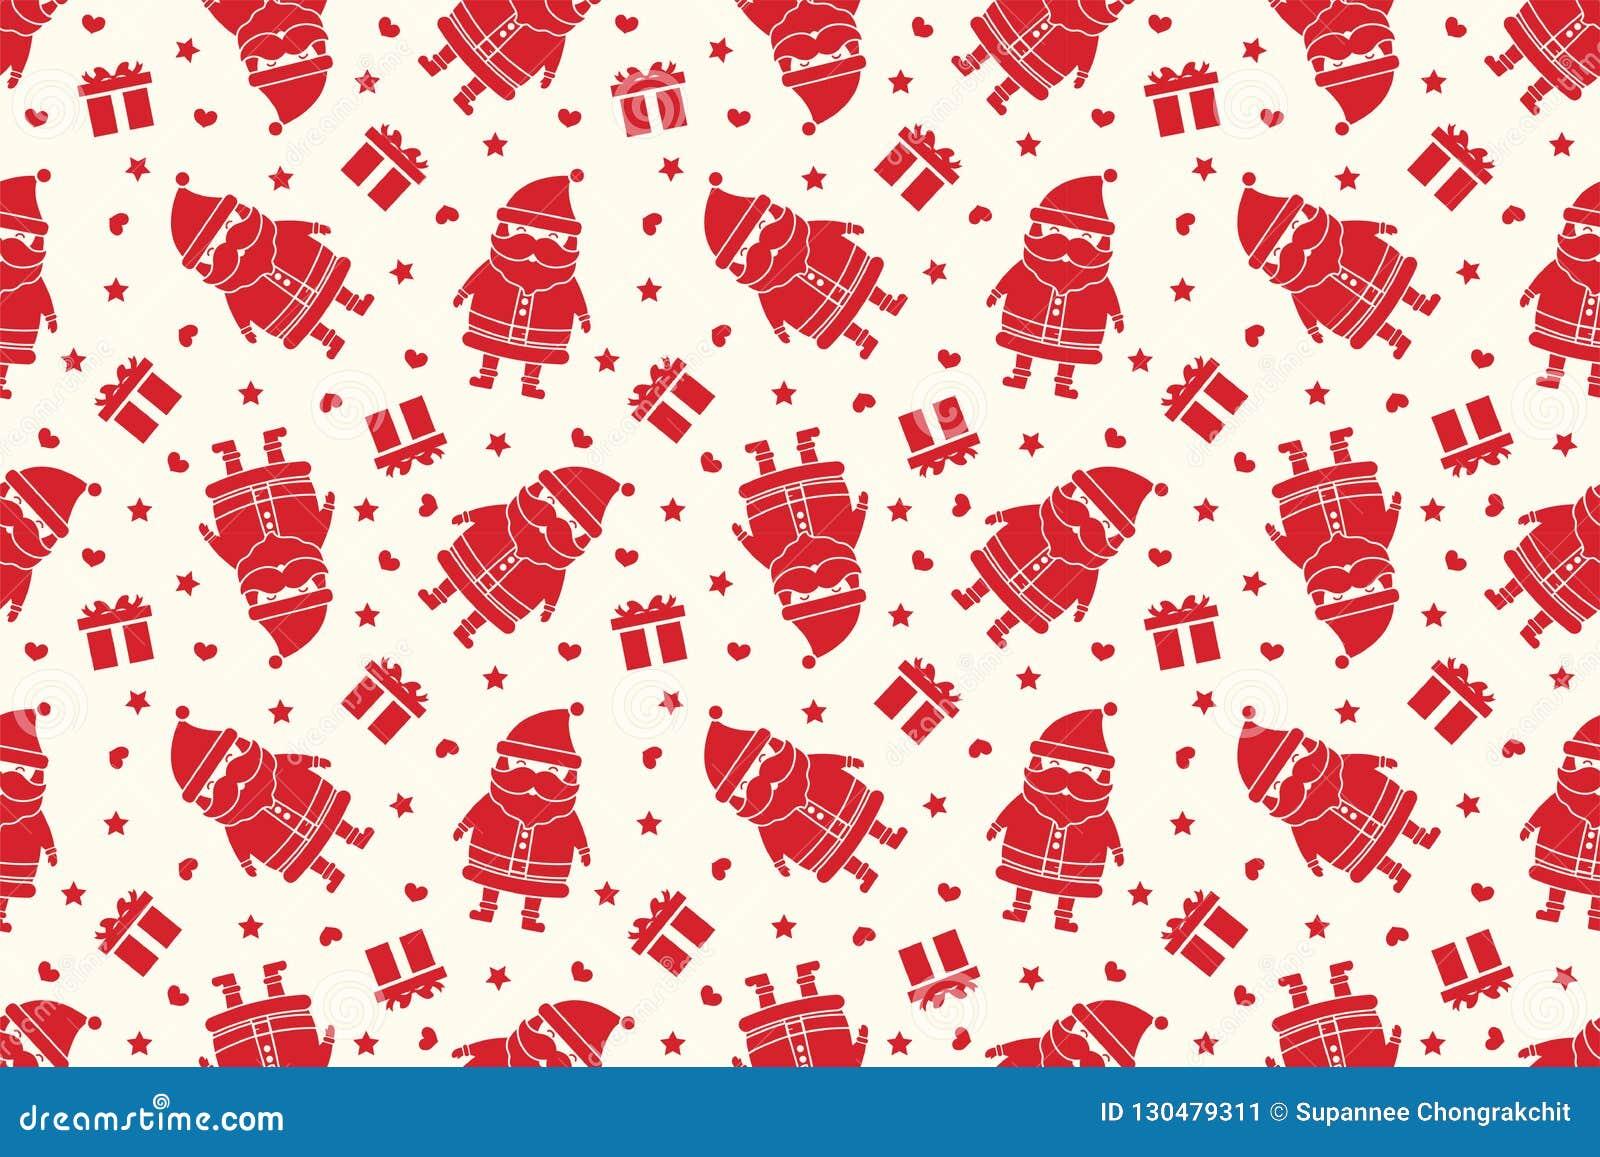 Merry Christmas Pattern Seamless Christmas Tree Background Red Xmas Wallpaper Stock Illustration Illustration Of Christmas Decoration 130479311